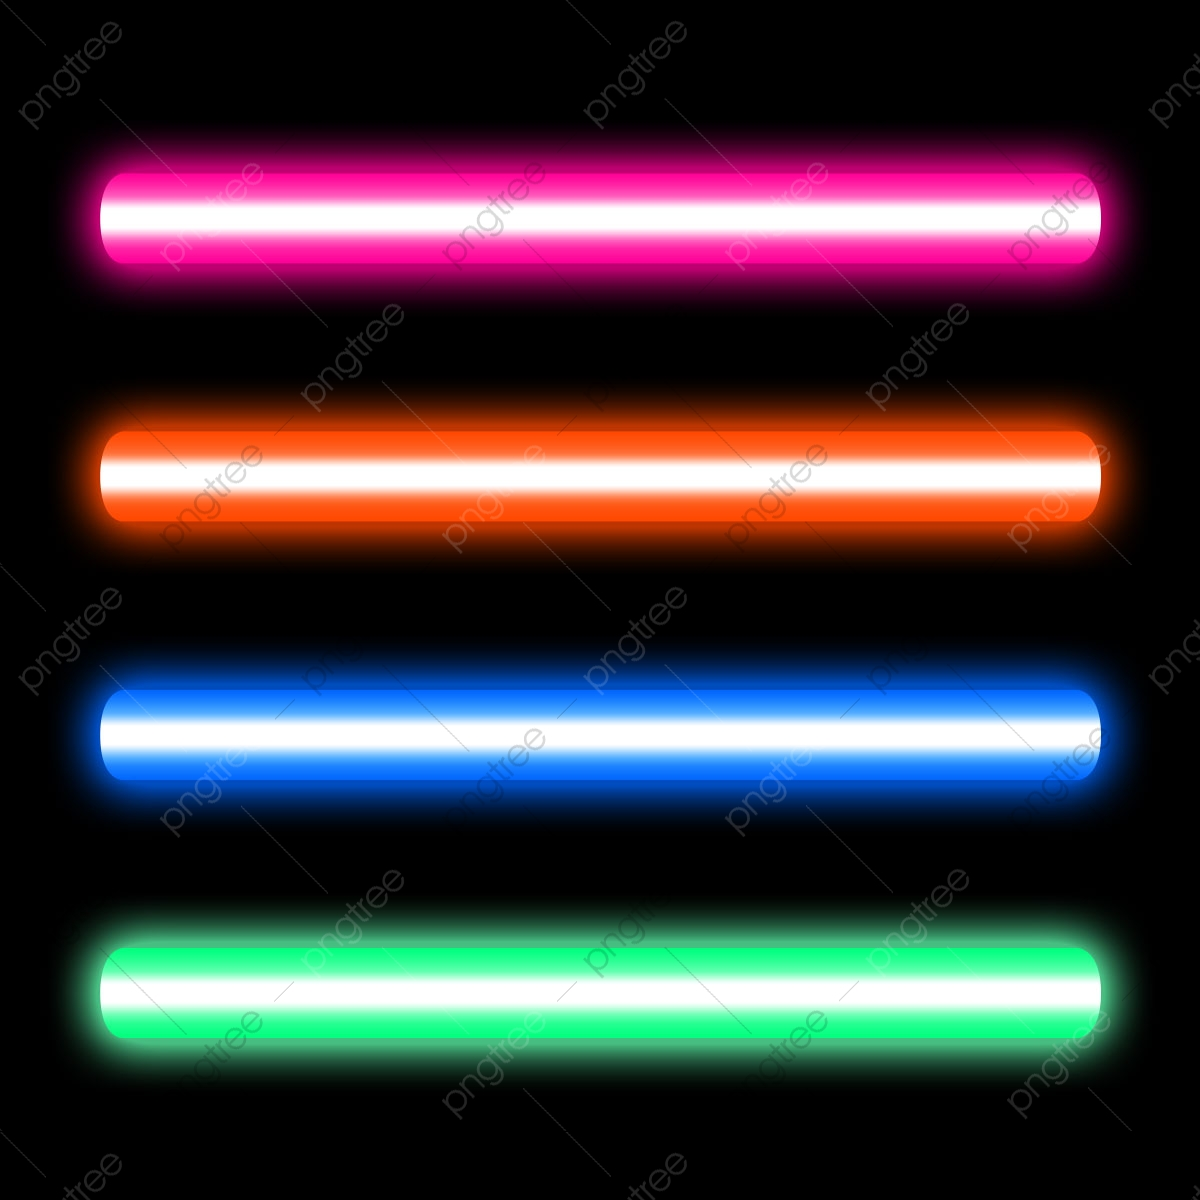 Laser Beam 4 Colors Effect Outer Glow Lighting Png Transparent Clipart Image And Psd File For Free Download Laser doppler vibrometer laser doppler velocimetry optics laser scanning vibrometry, others png. https pngtree com freepng laser beam 4 colors 5306387 html